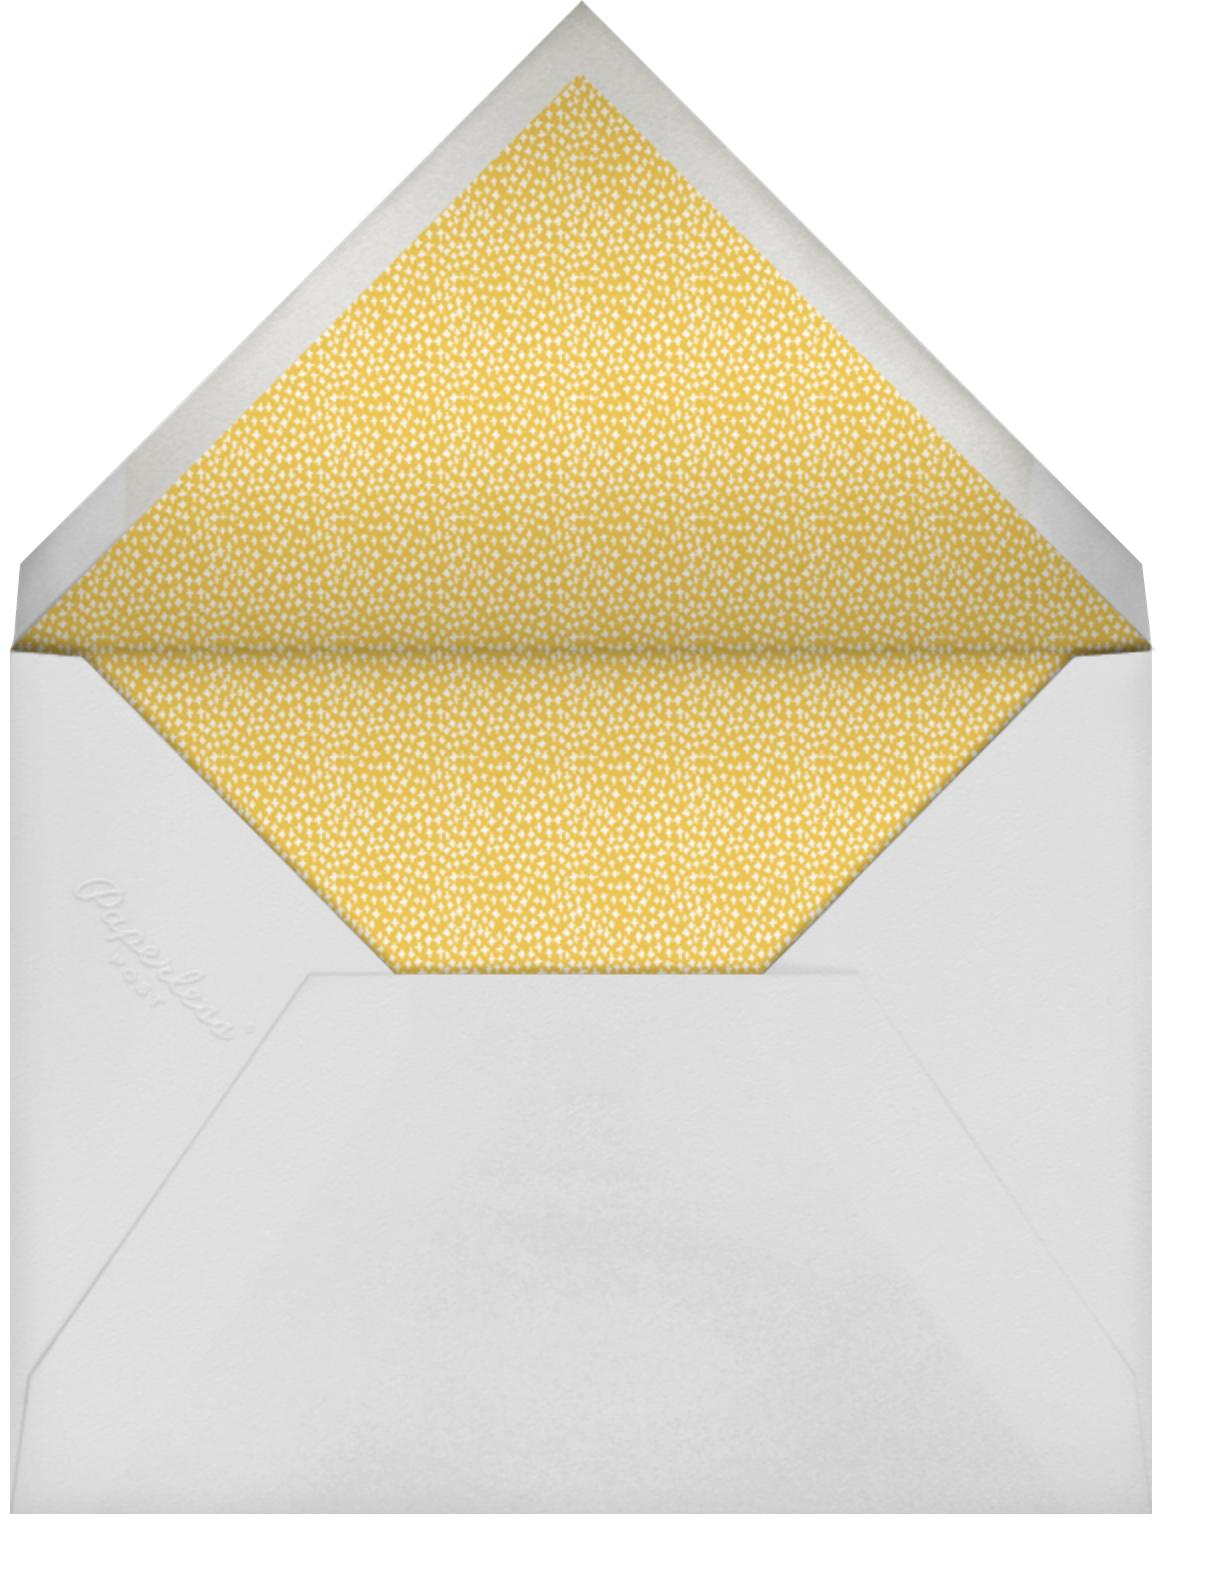 Among the Daisies - Blossom - Mr. Boddington's Studio - Kids' birthday - envelope back